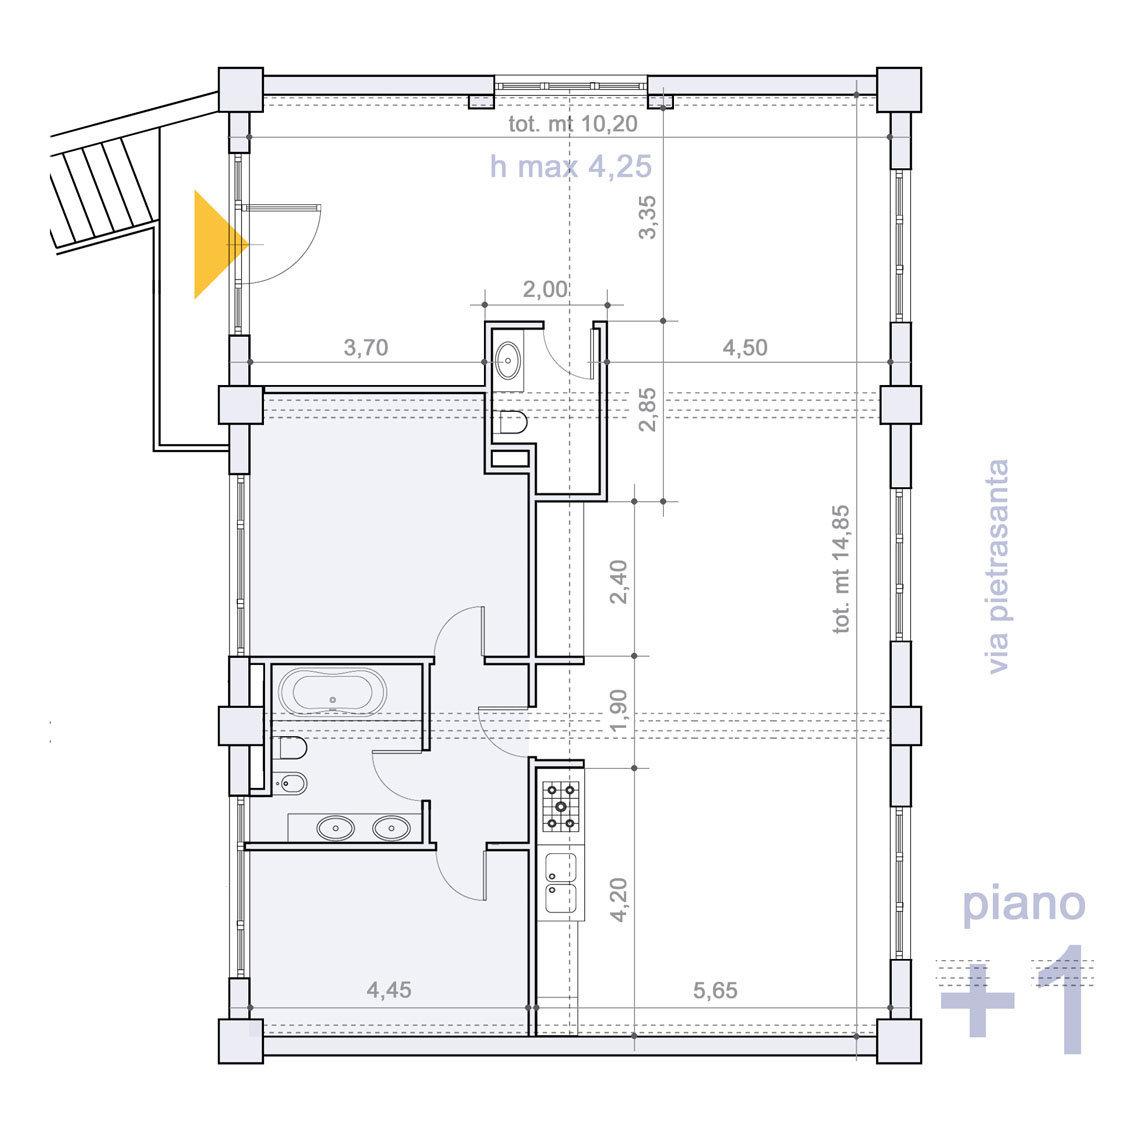 LOCATION PIETRASANTA  1 w.jpg